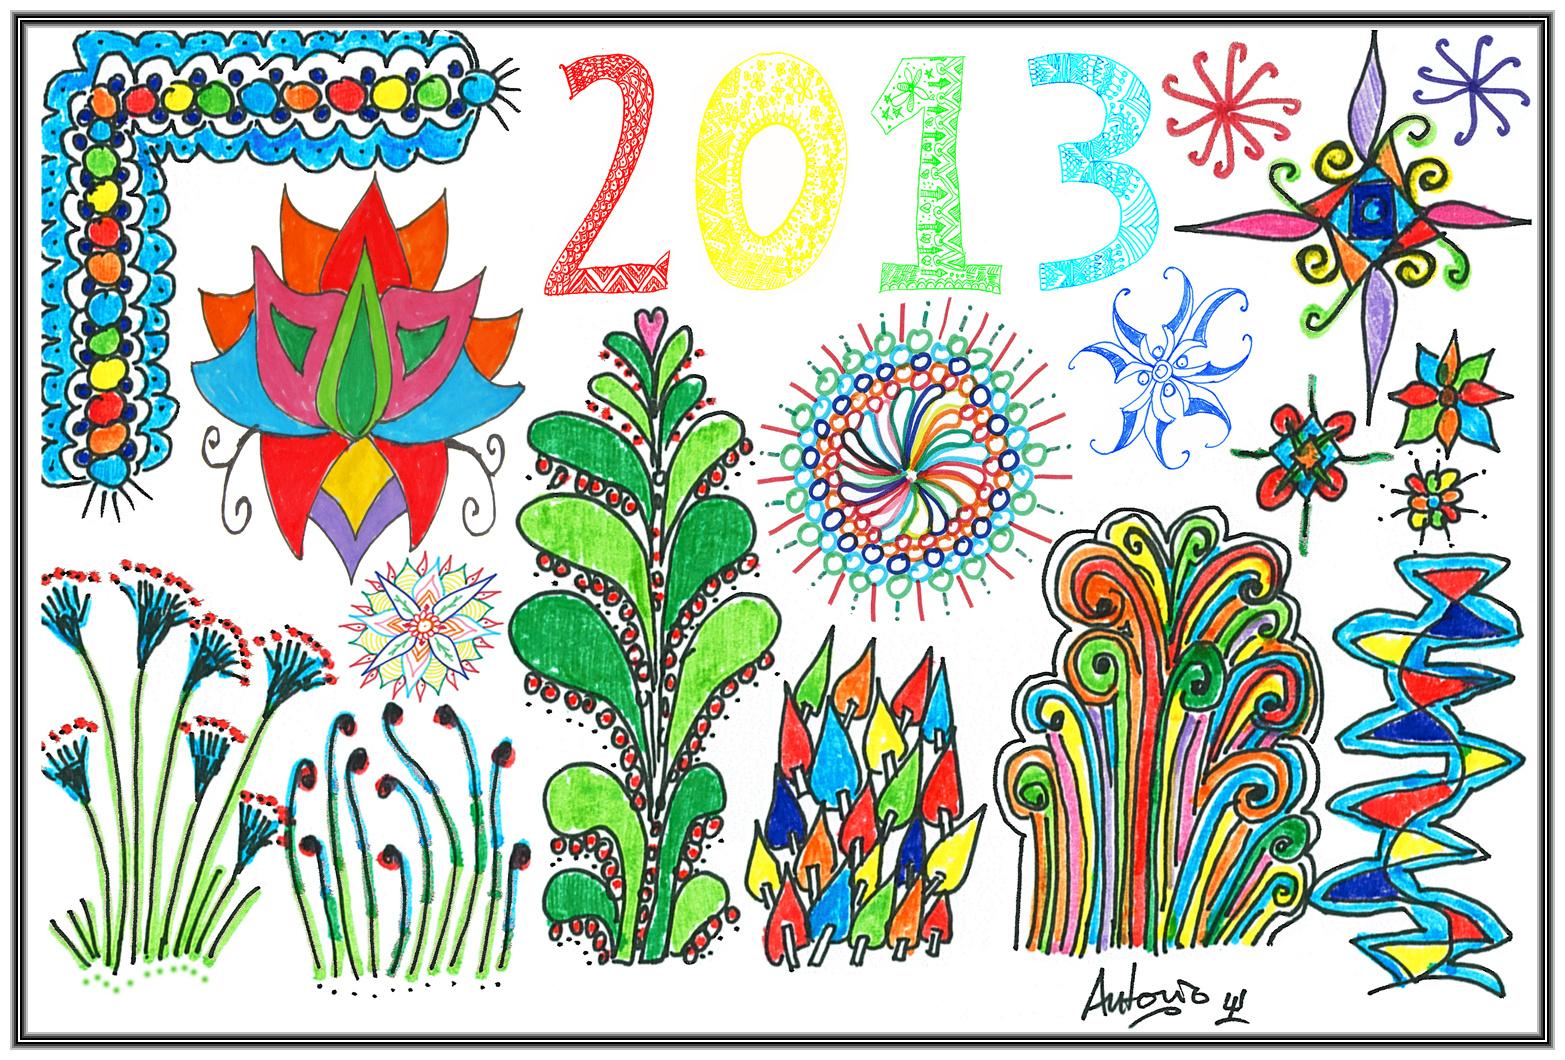 Feliz Año Nuevo 2013 - Happy New Year 2013 - Colour Zentangle.